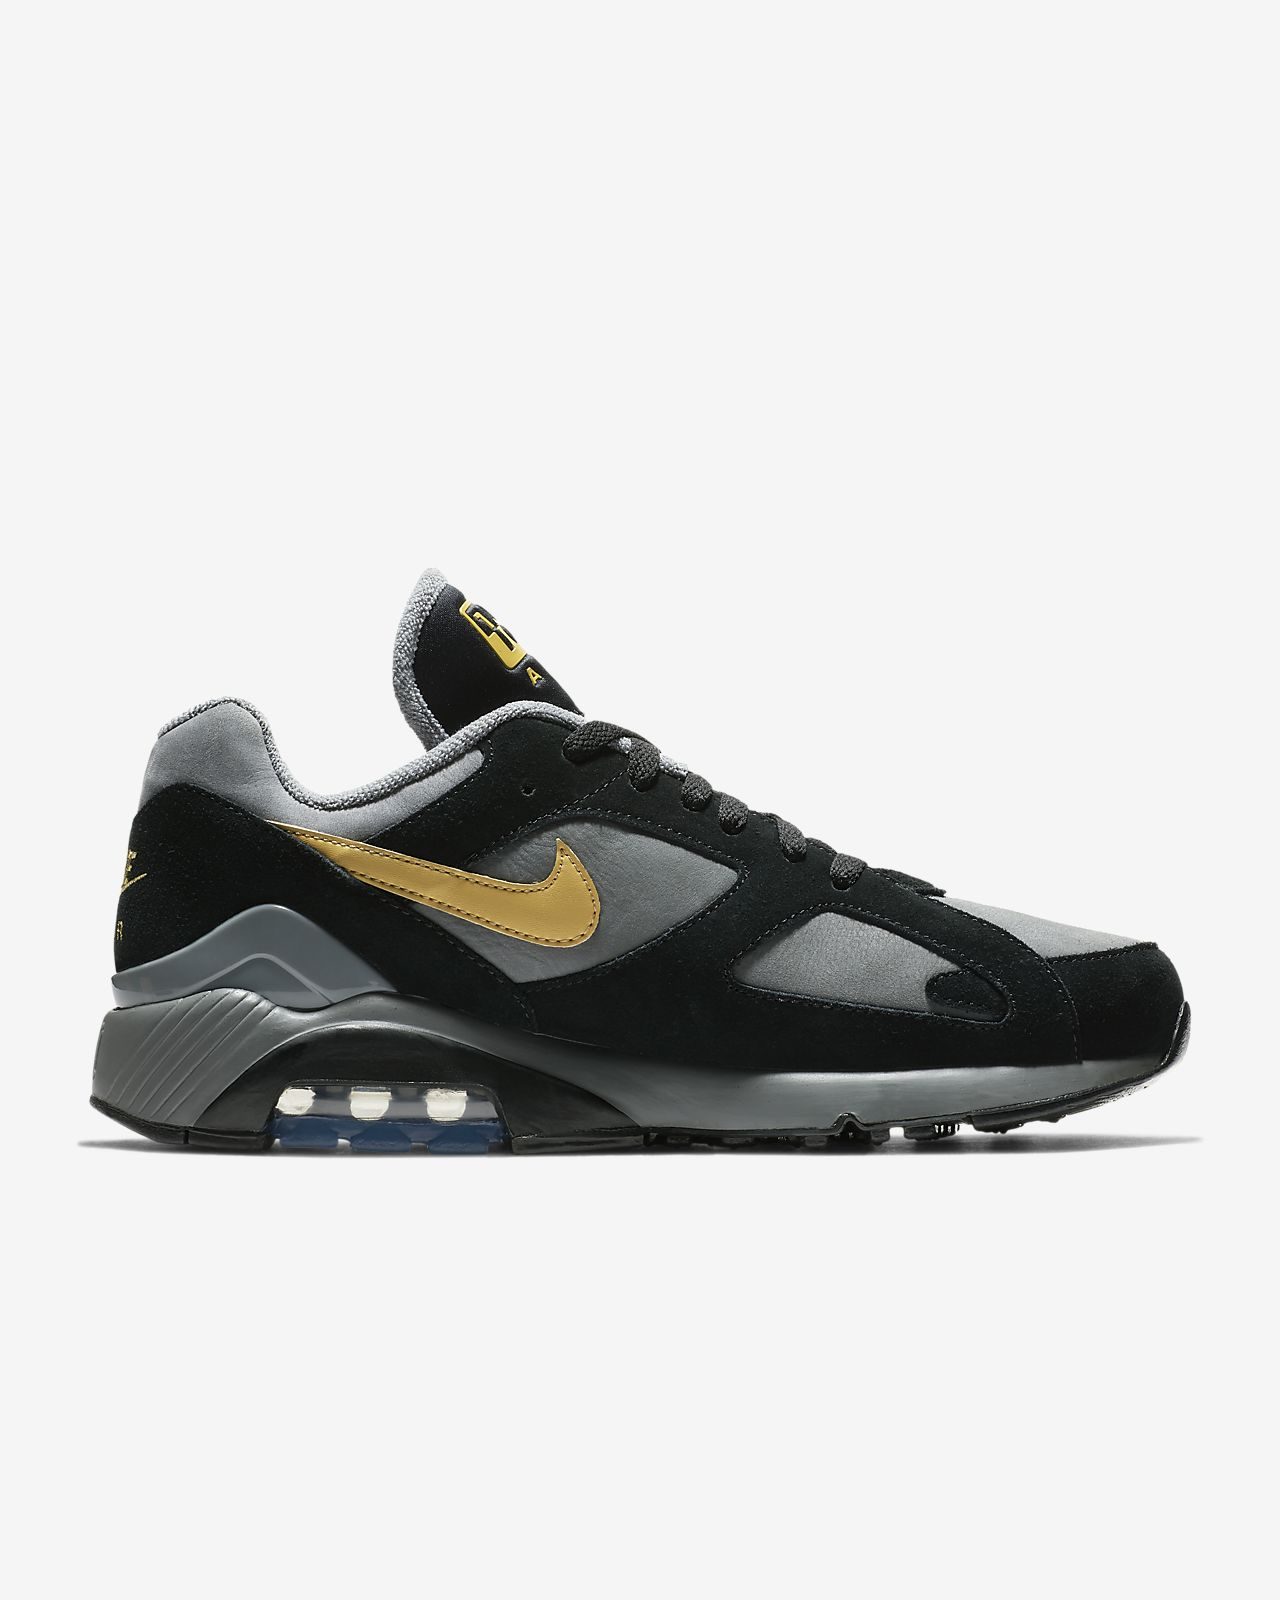 timeless design e8ea7 8d60e ... Nike Air Max 180-sko til mænd